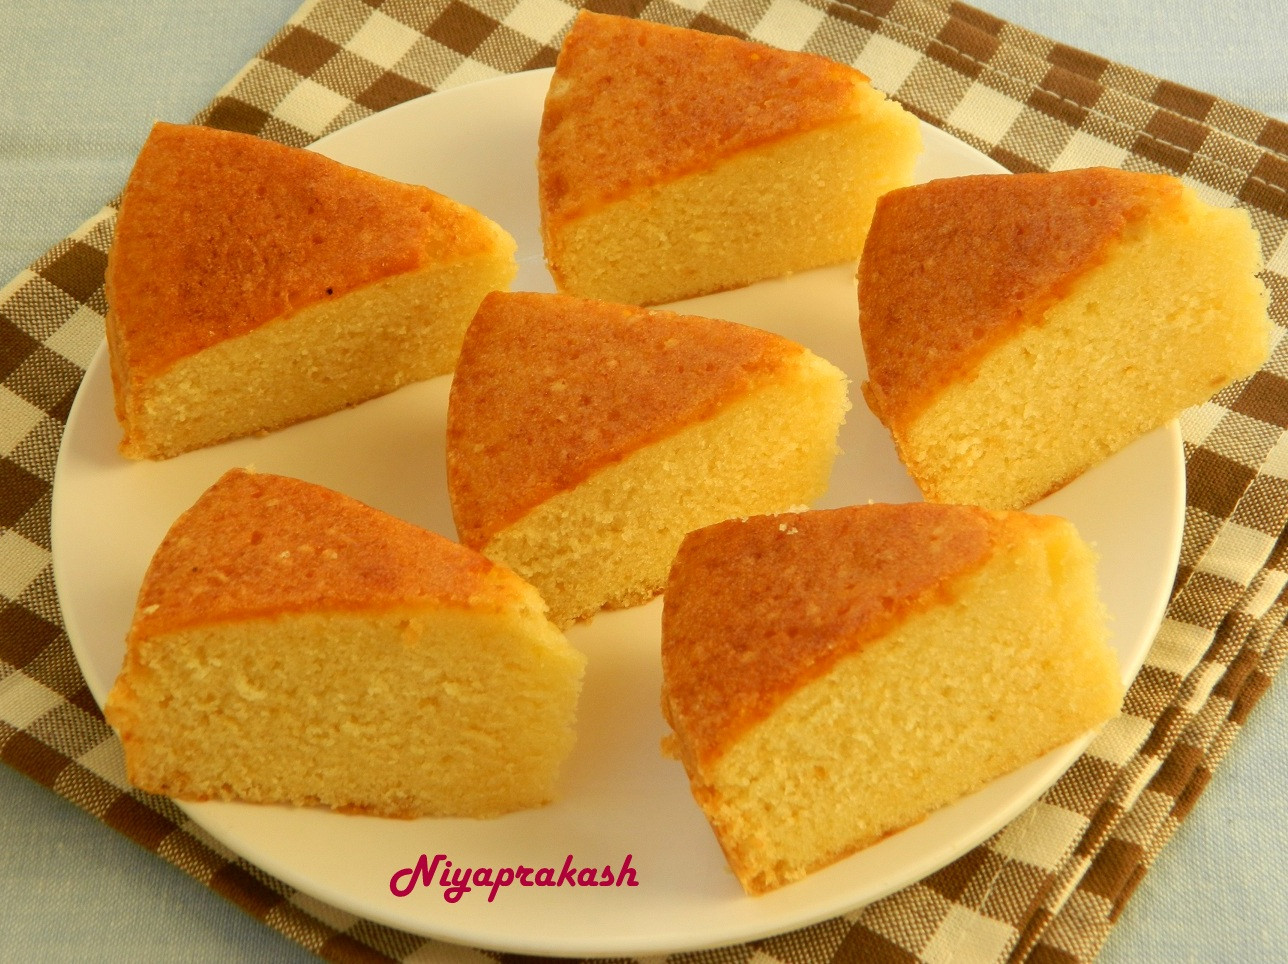 Sponge Cake Recipe  Niya s World Sponge Cake 3rd recipe